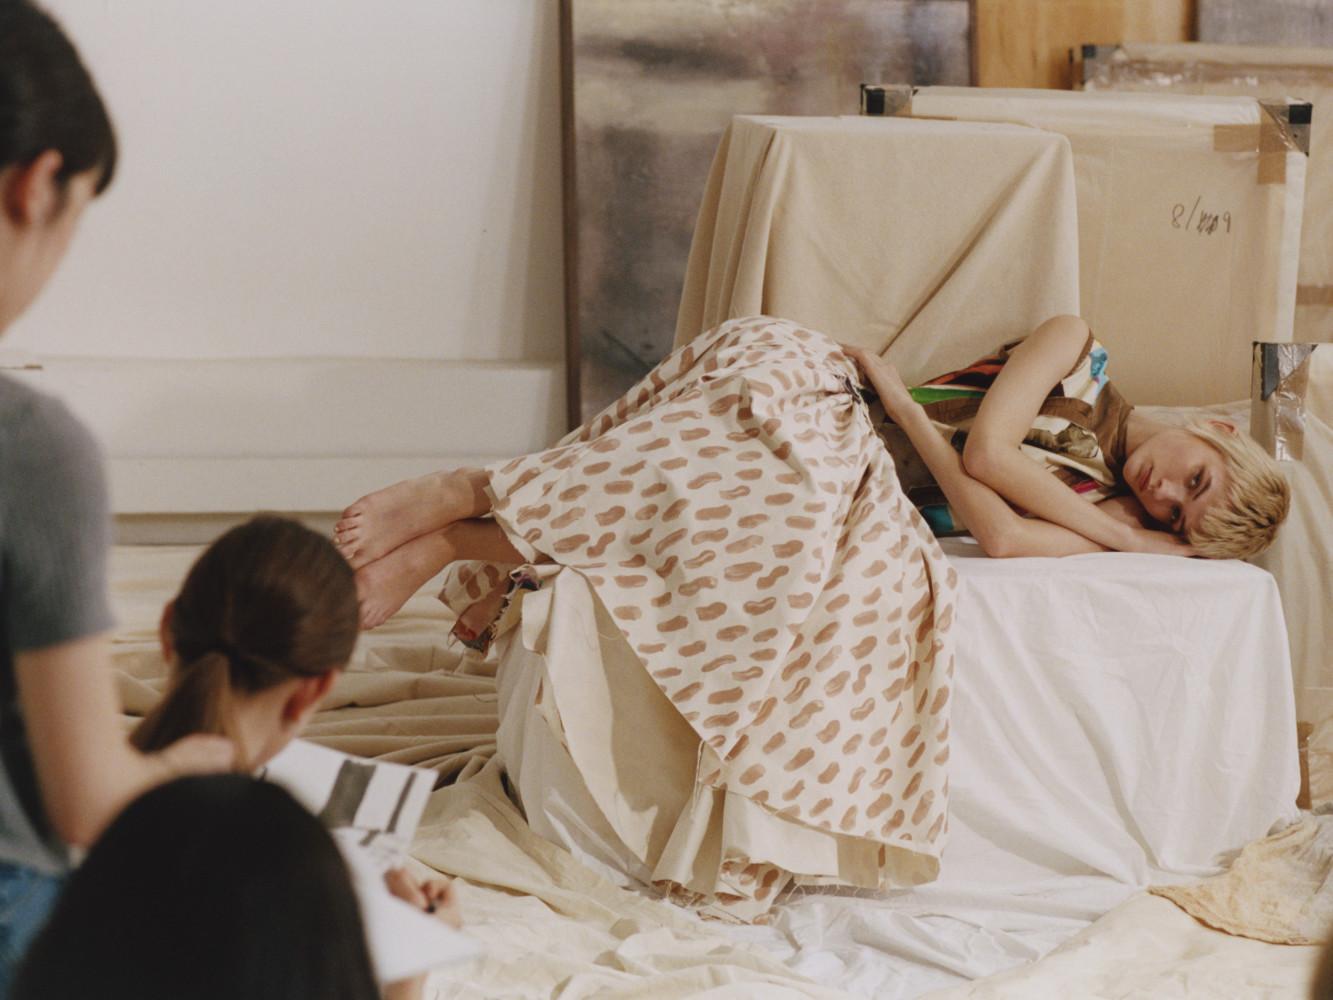 Lara Mullen wearing Marni lensed by Chloe Le Drezen for SSAW Magazine March 2019.